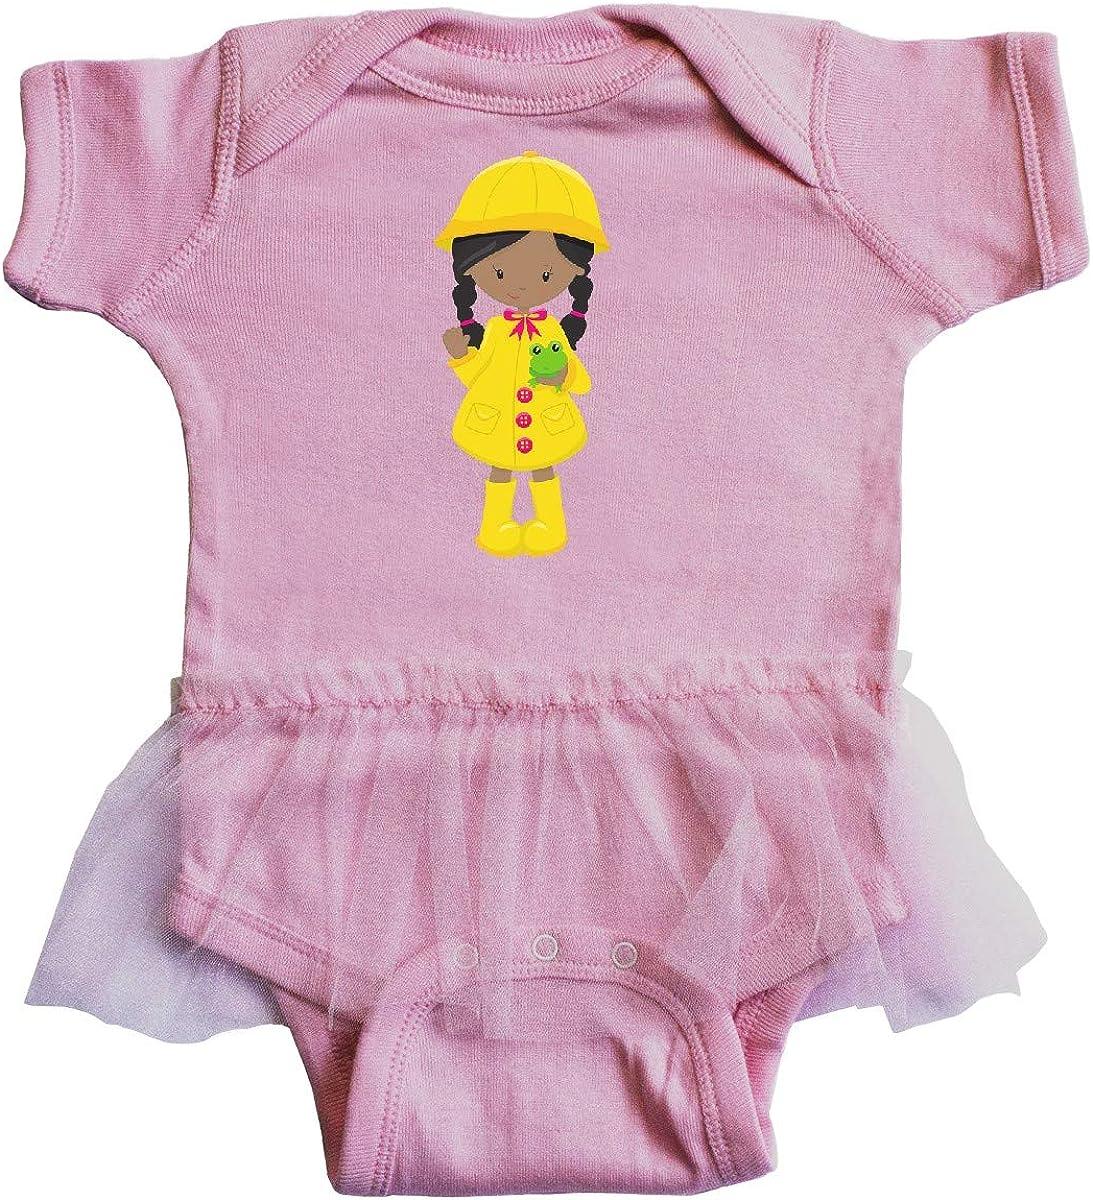 inktastic African American Girl Frog Infant Tutu Bodysuit Yellow Raincoat